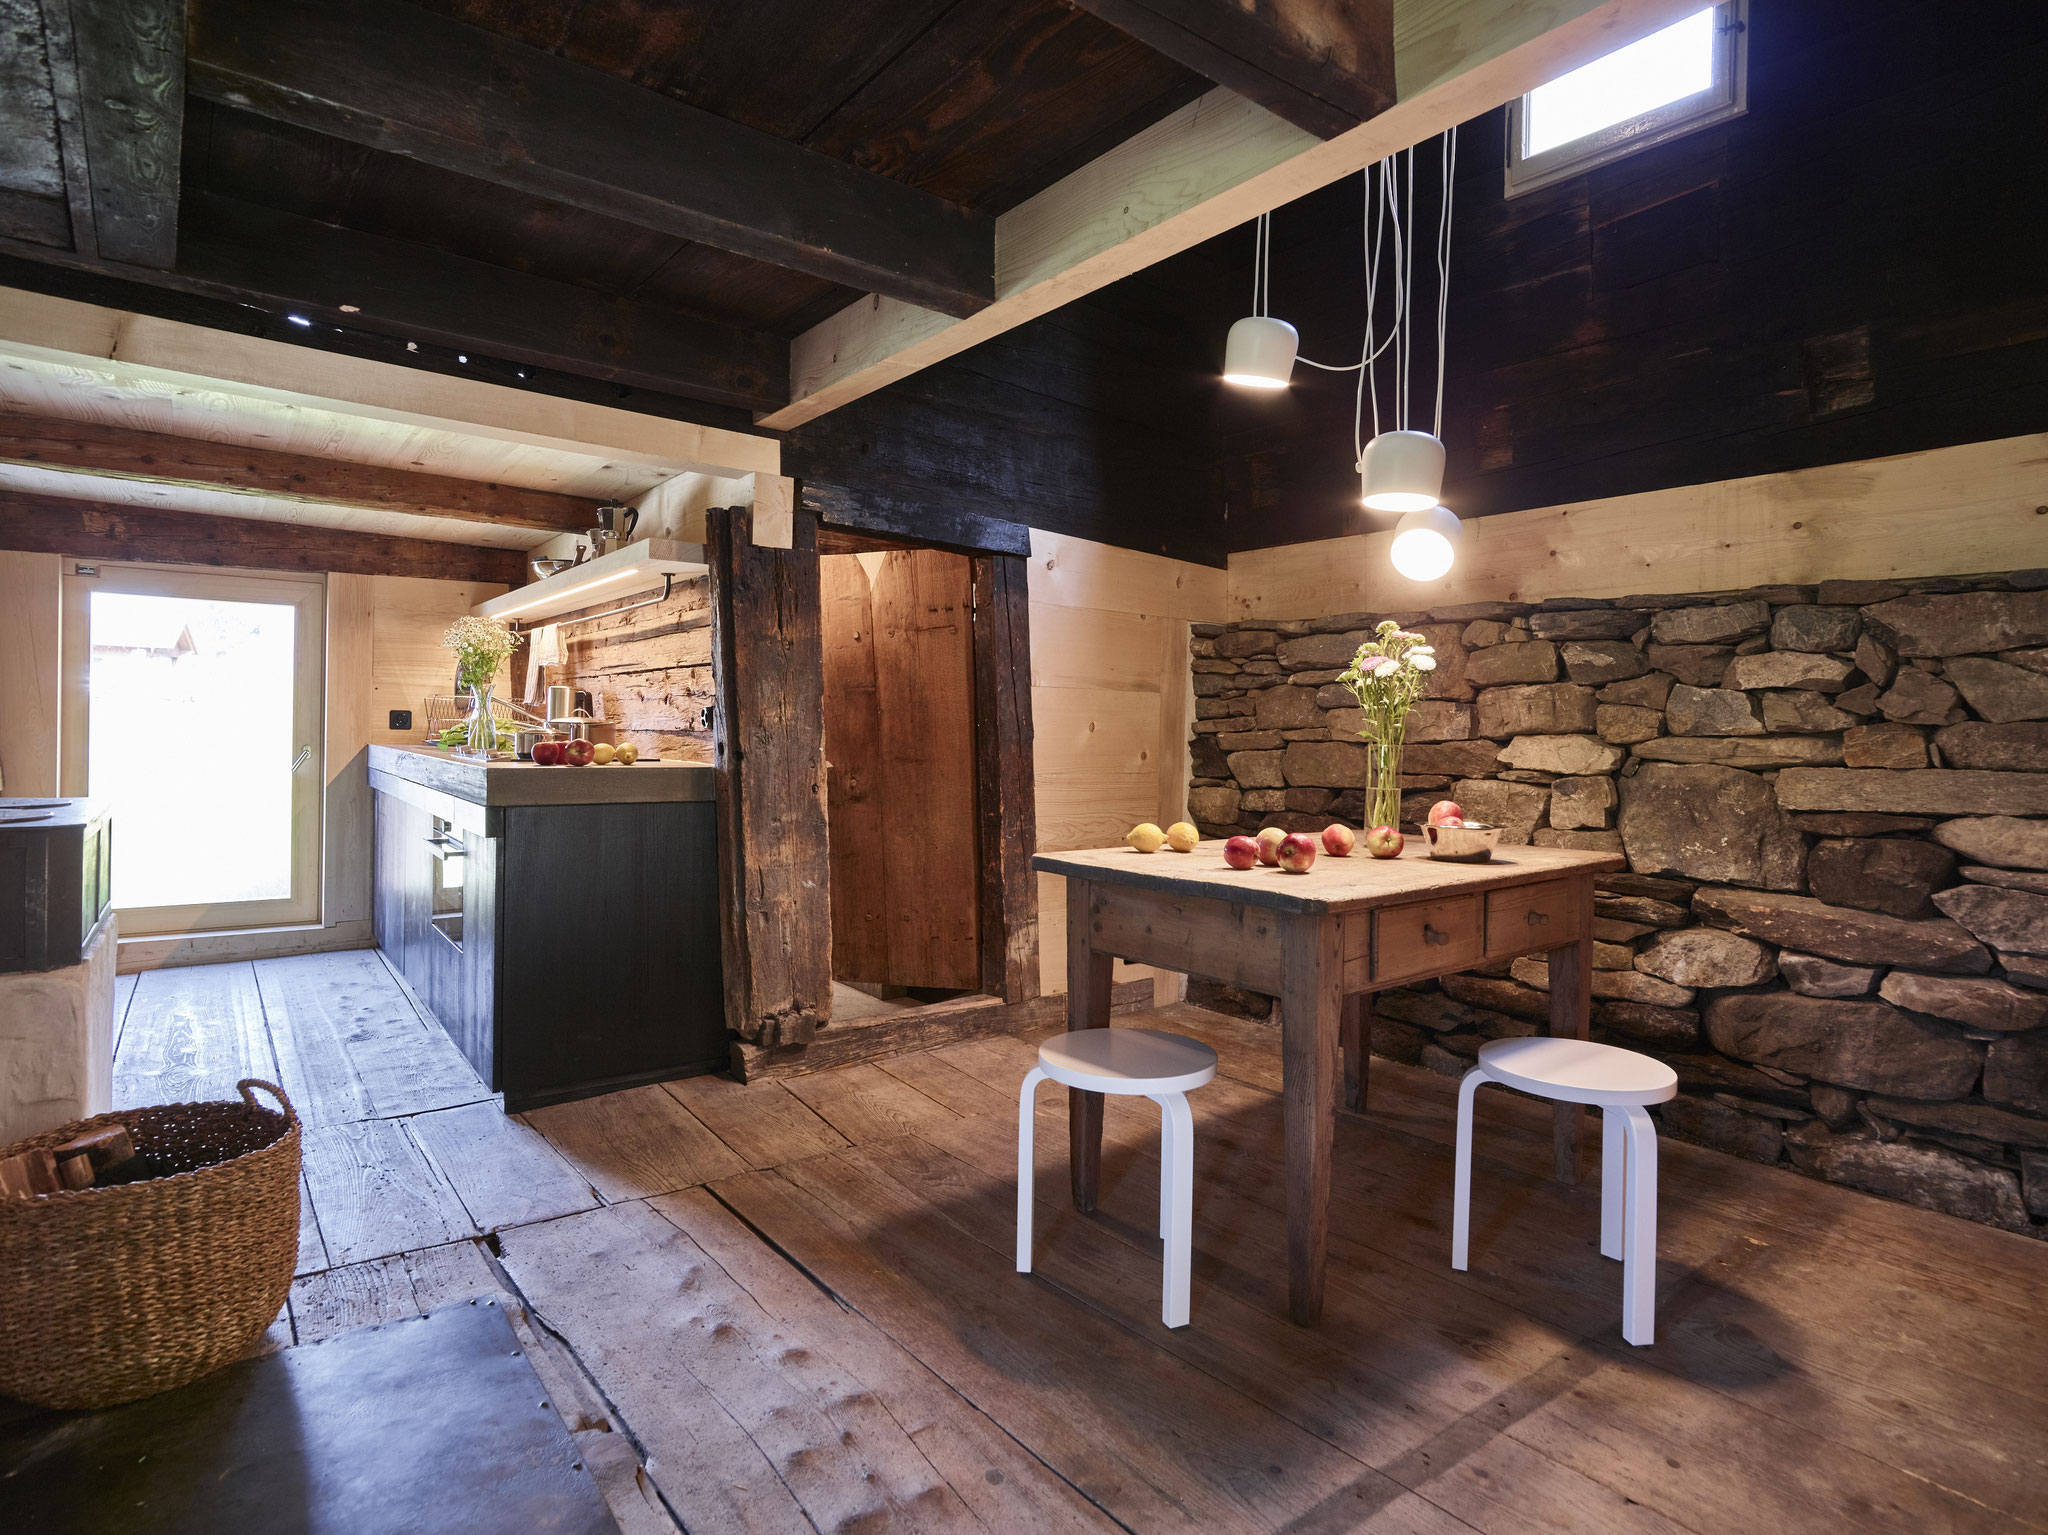 Offene Küche inkl. Trockensteinmauer (Ferien im Baudenkmal © Gataric Fotografie)